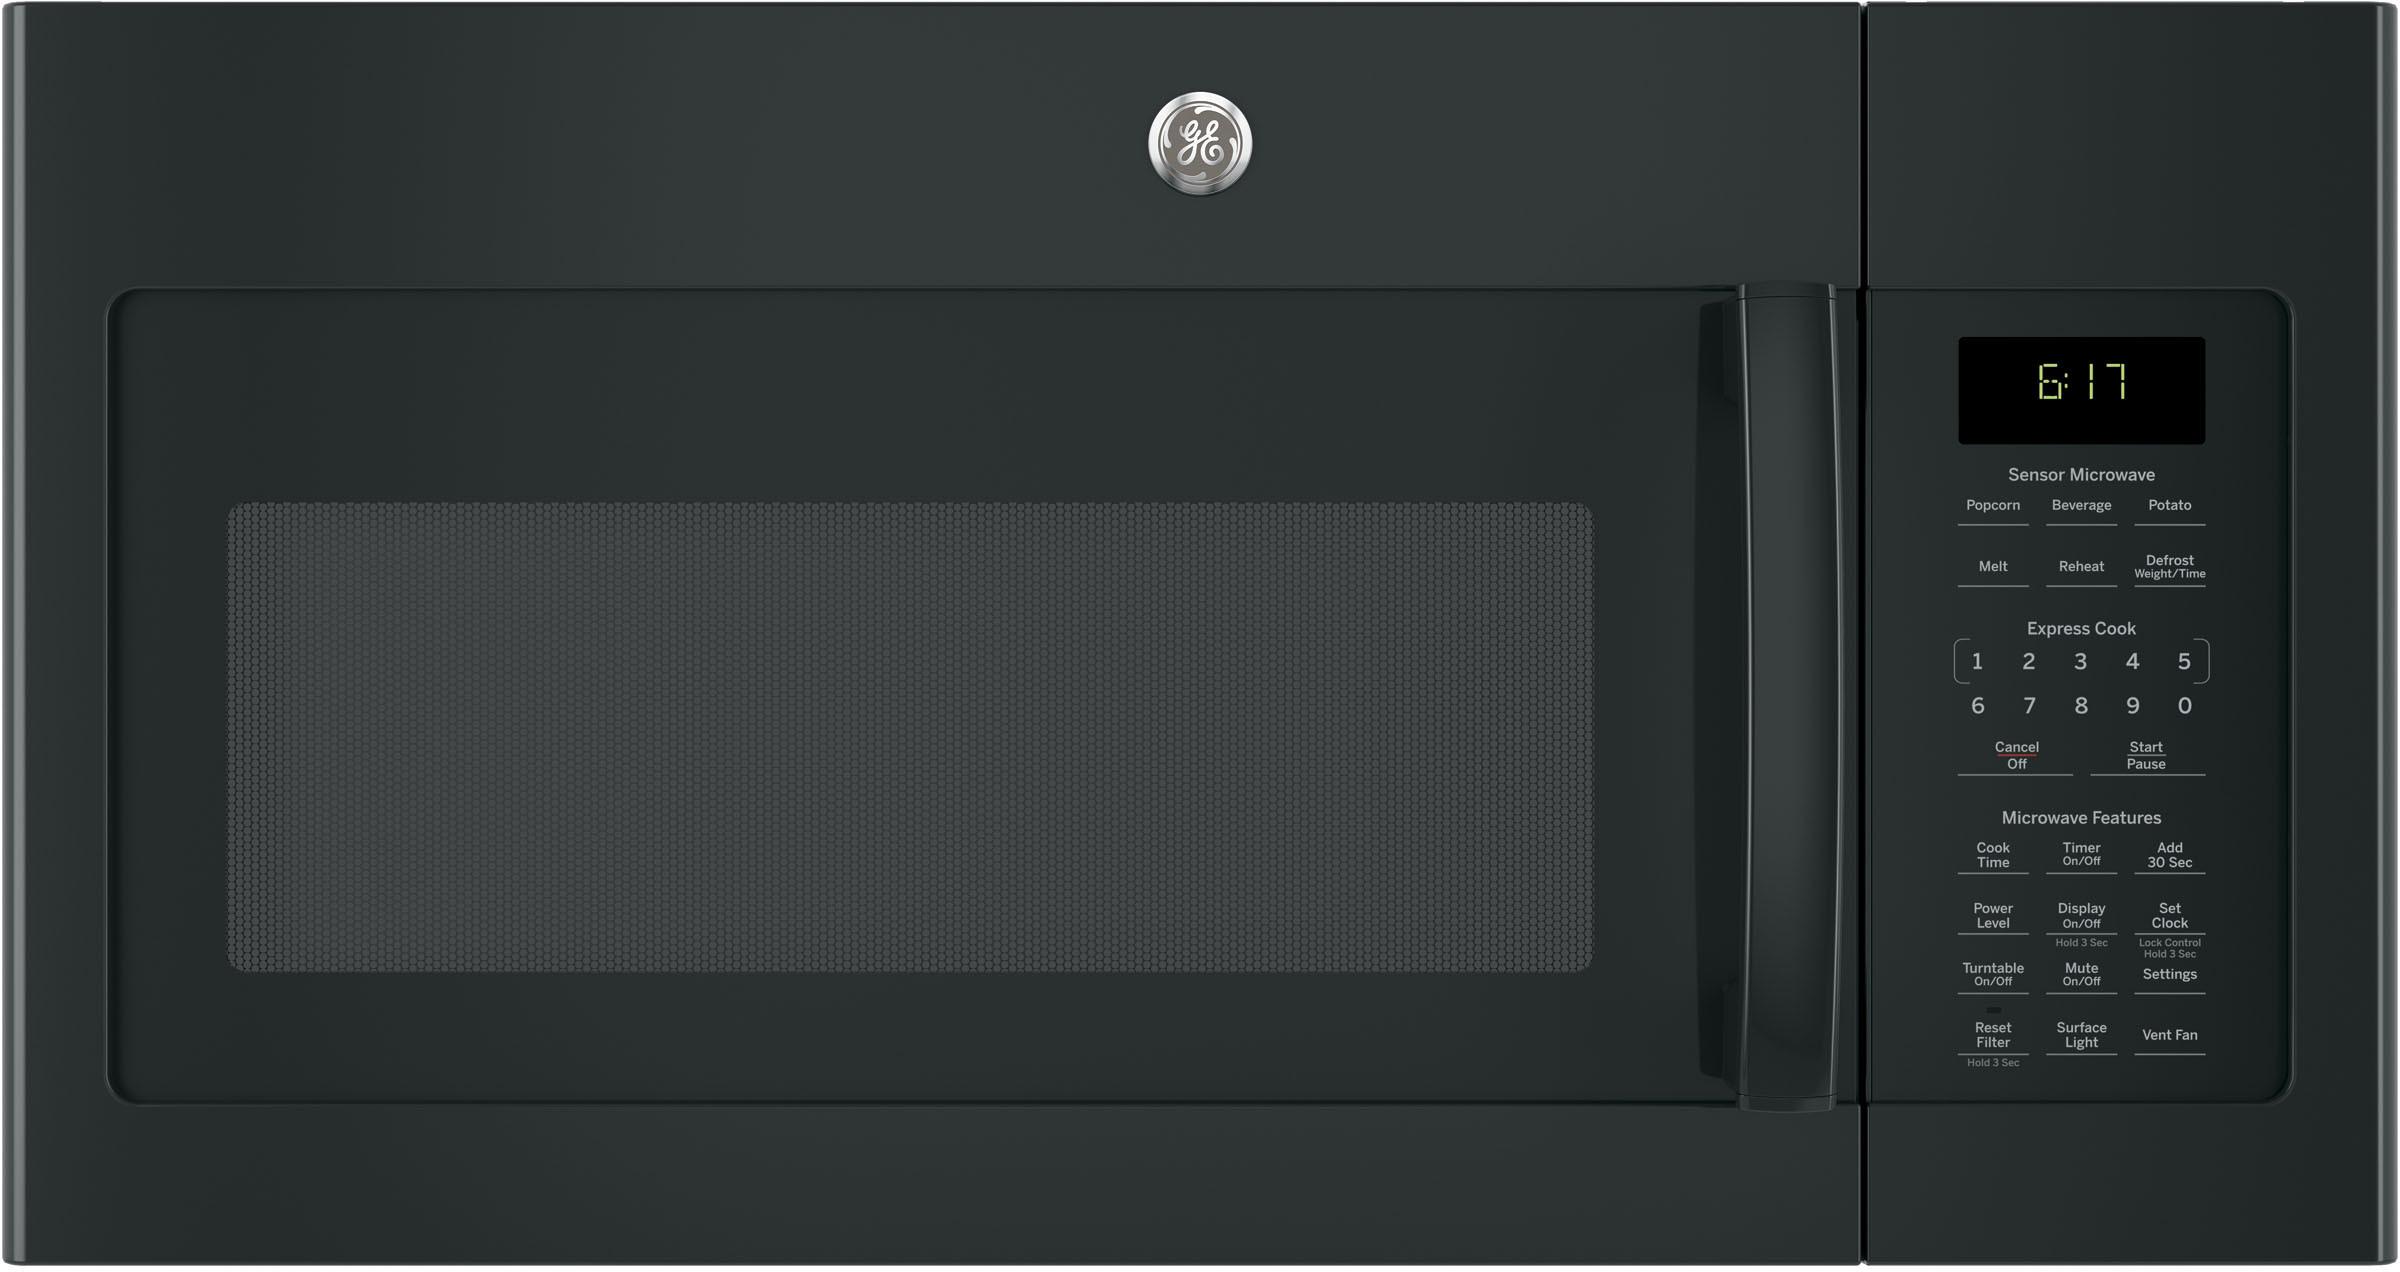 Ge Jvm6175dkbb 1 7 Cu Ft Over The Range Microwave With 000 Watts 300 Cfm Ventilation 10 Levels Sensor Cooking Melt Feature Add 30 Seconds